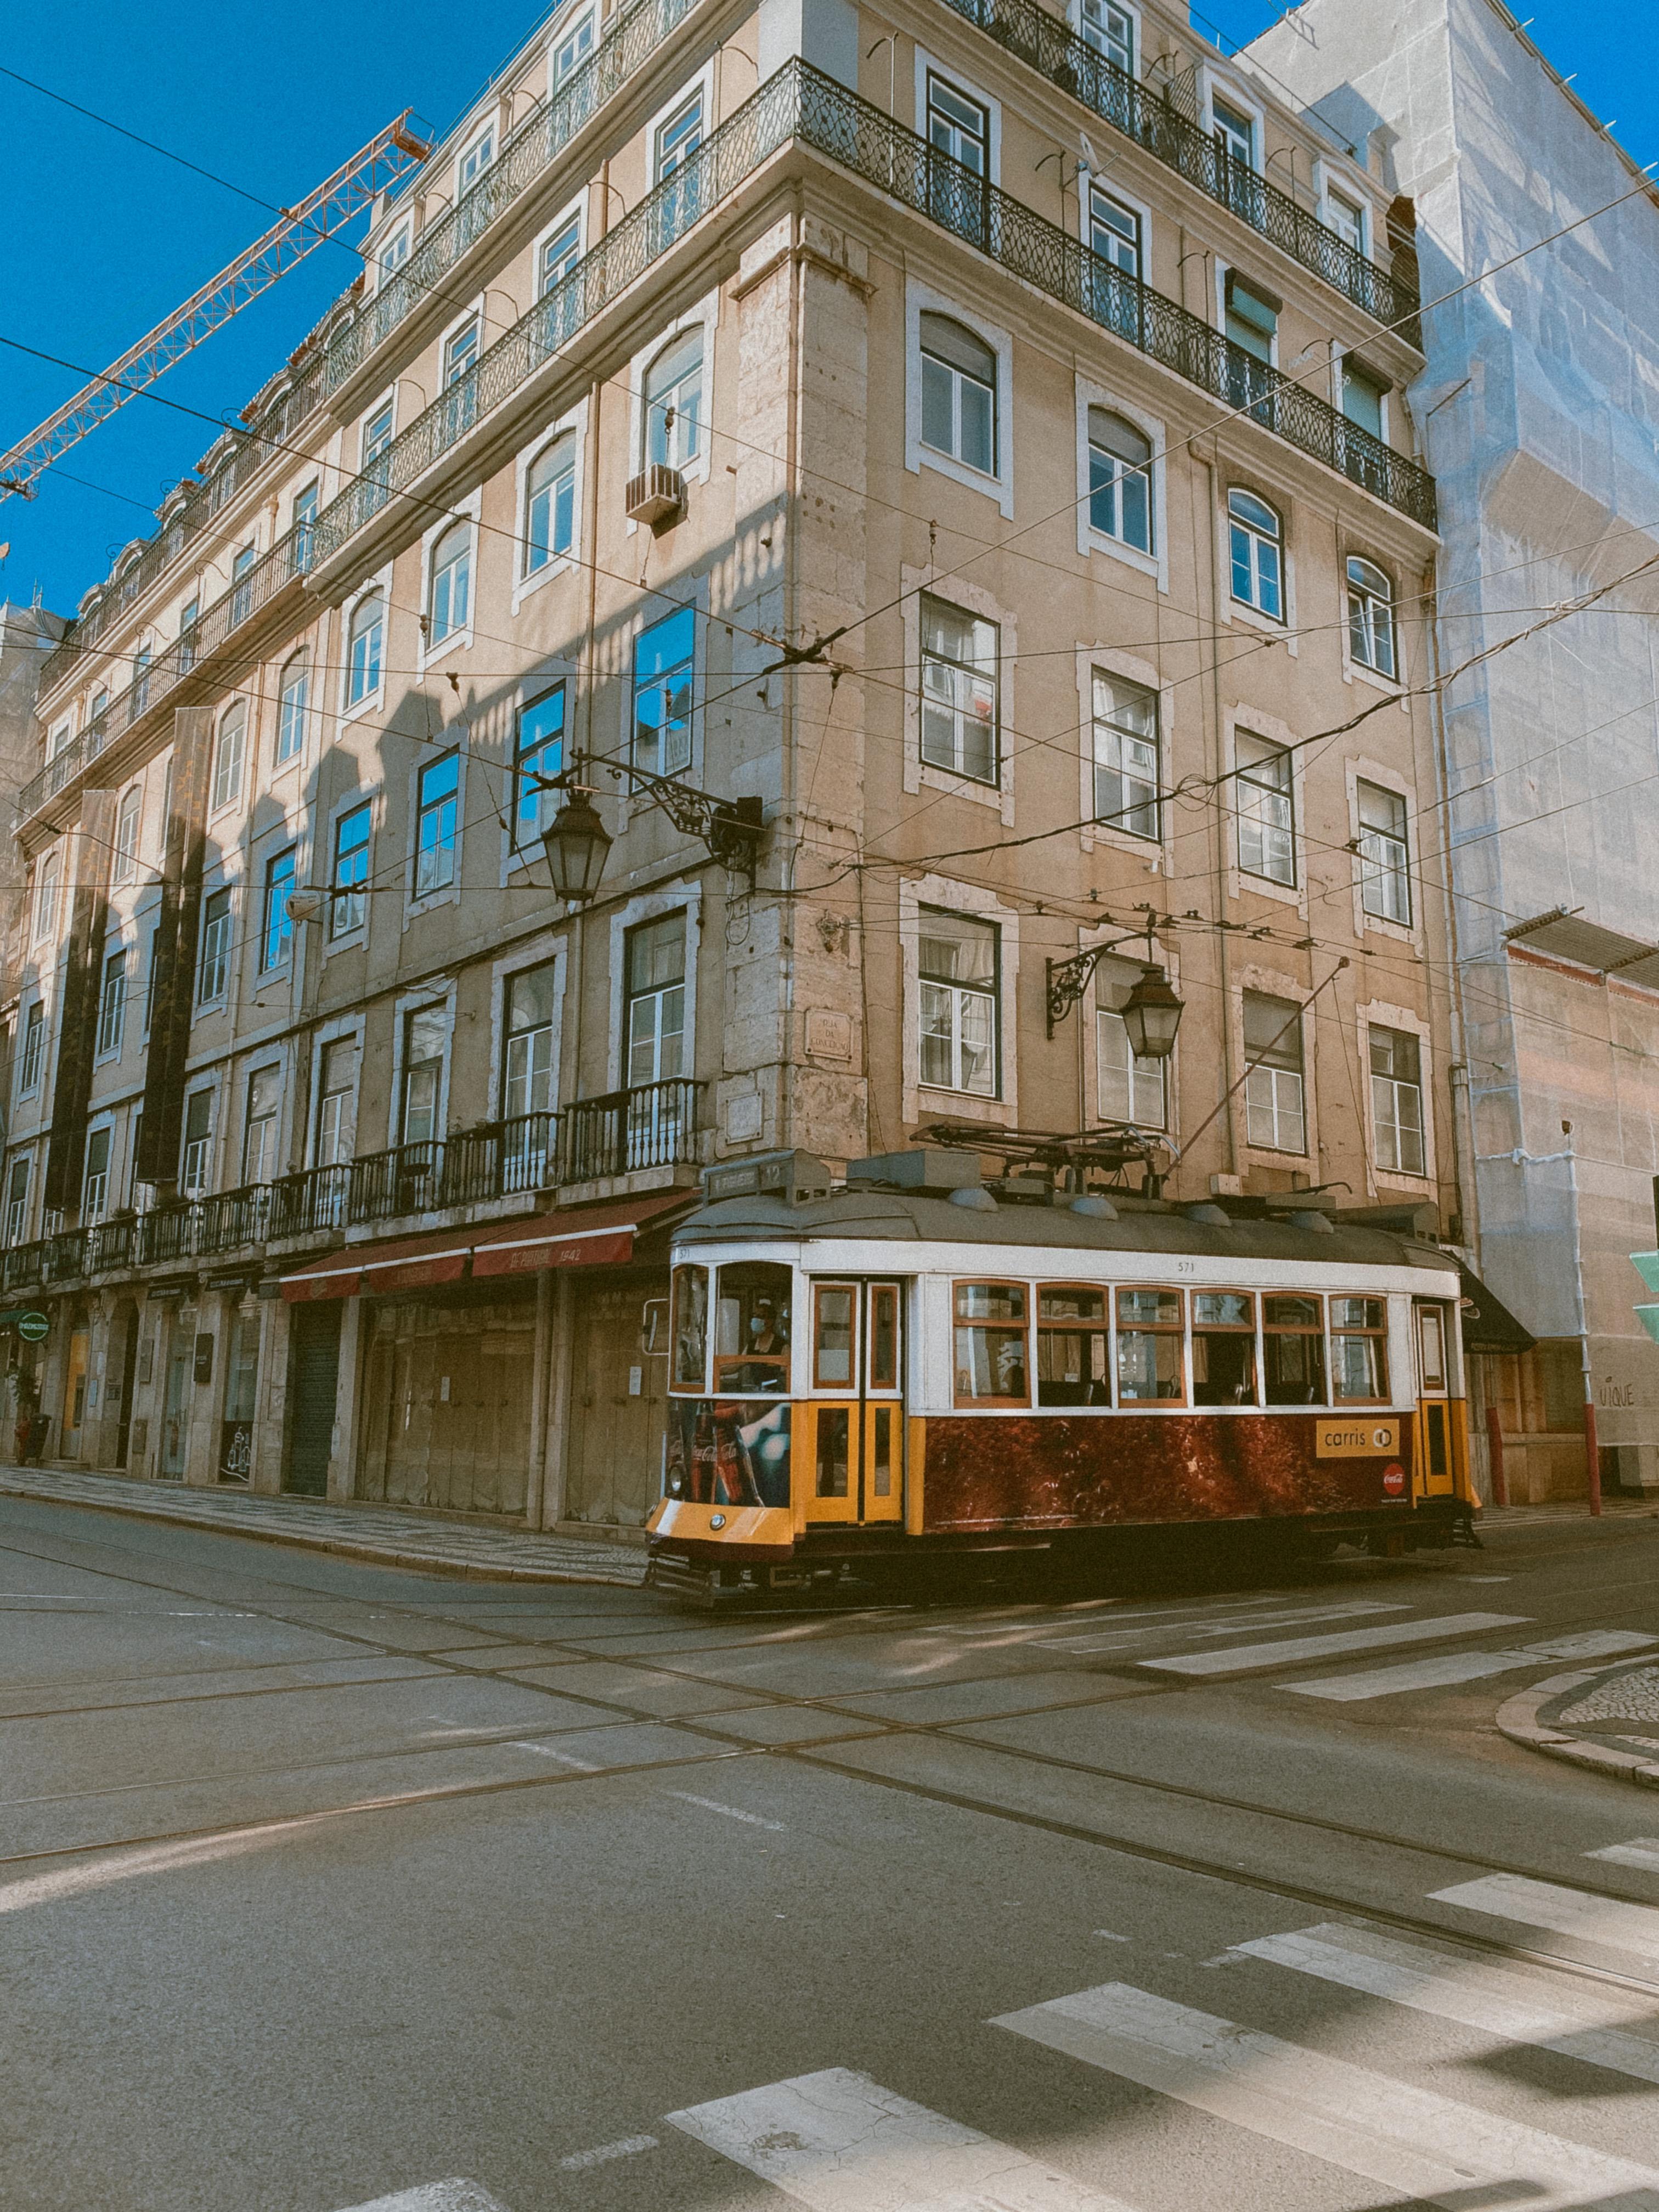 Rückkehr nach Lissabon